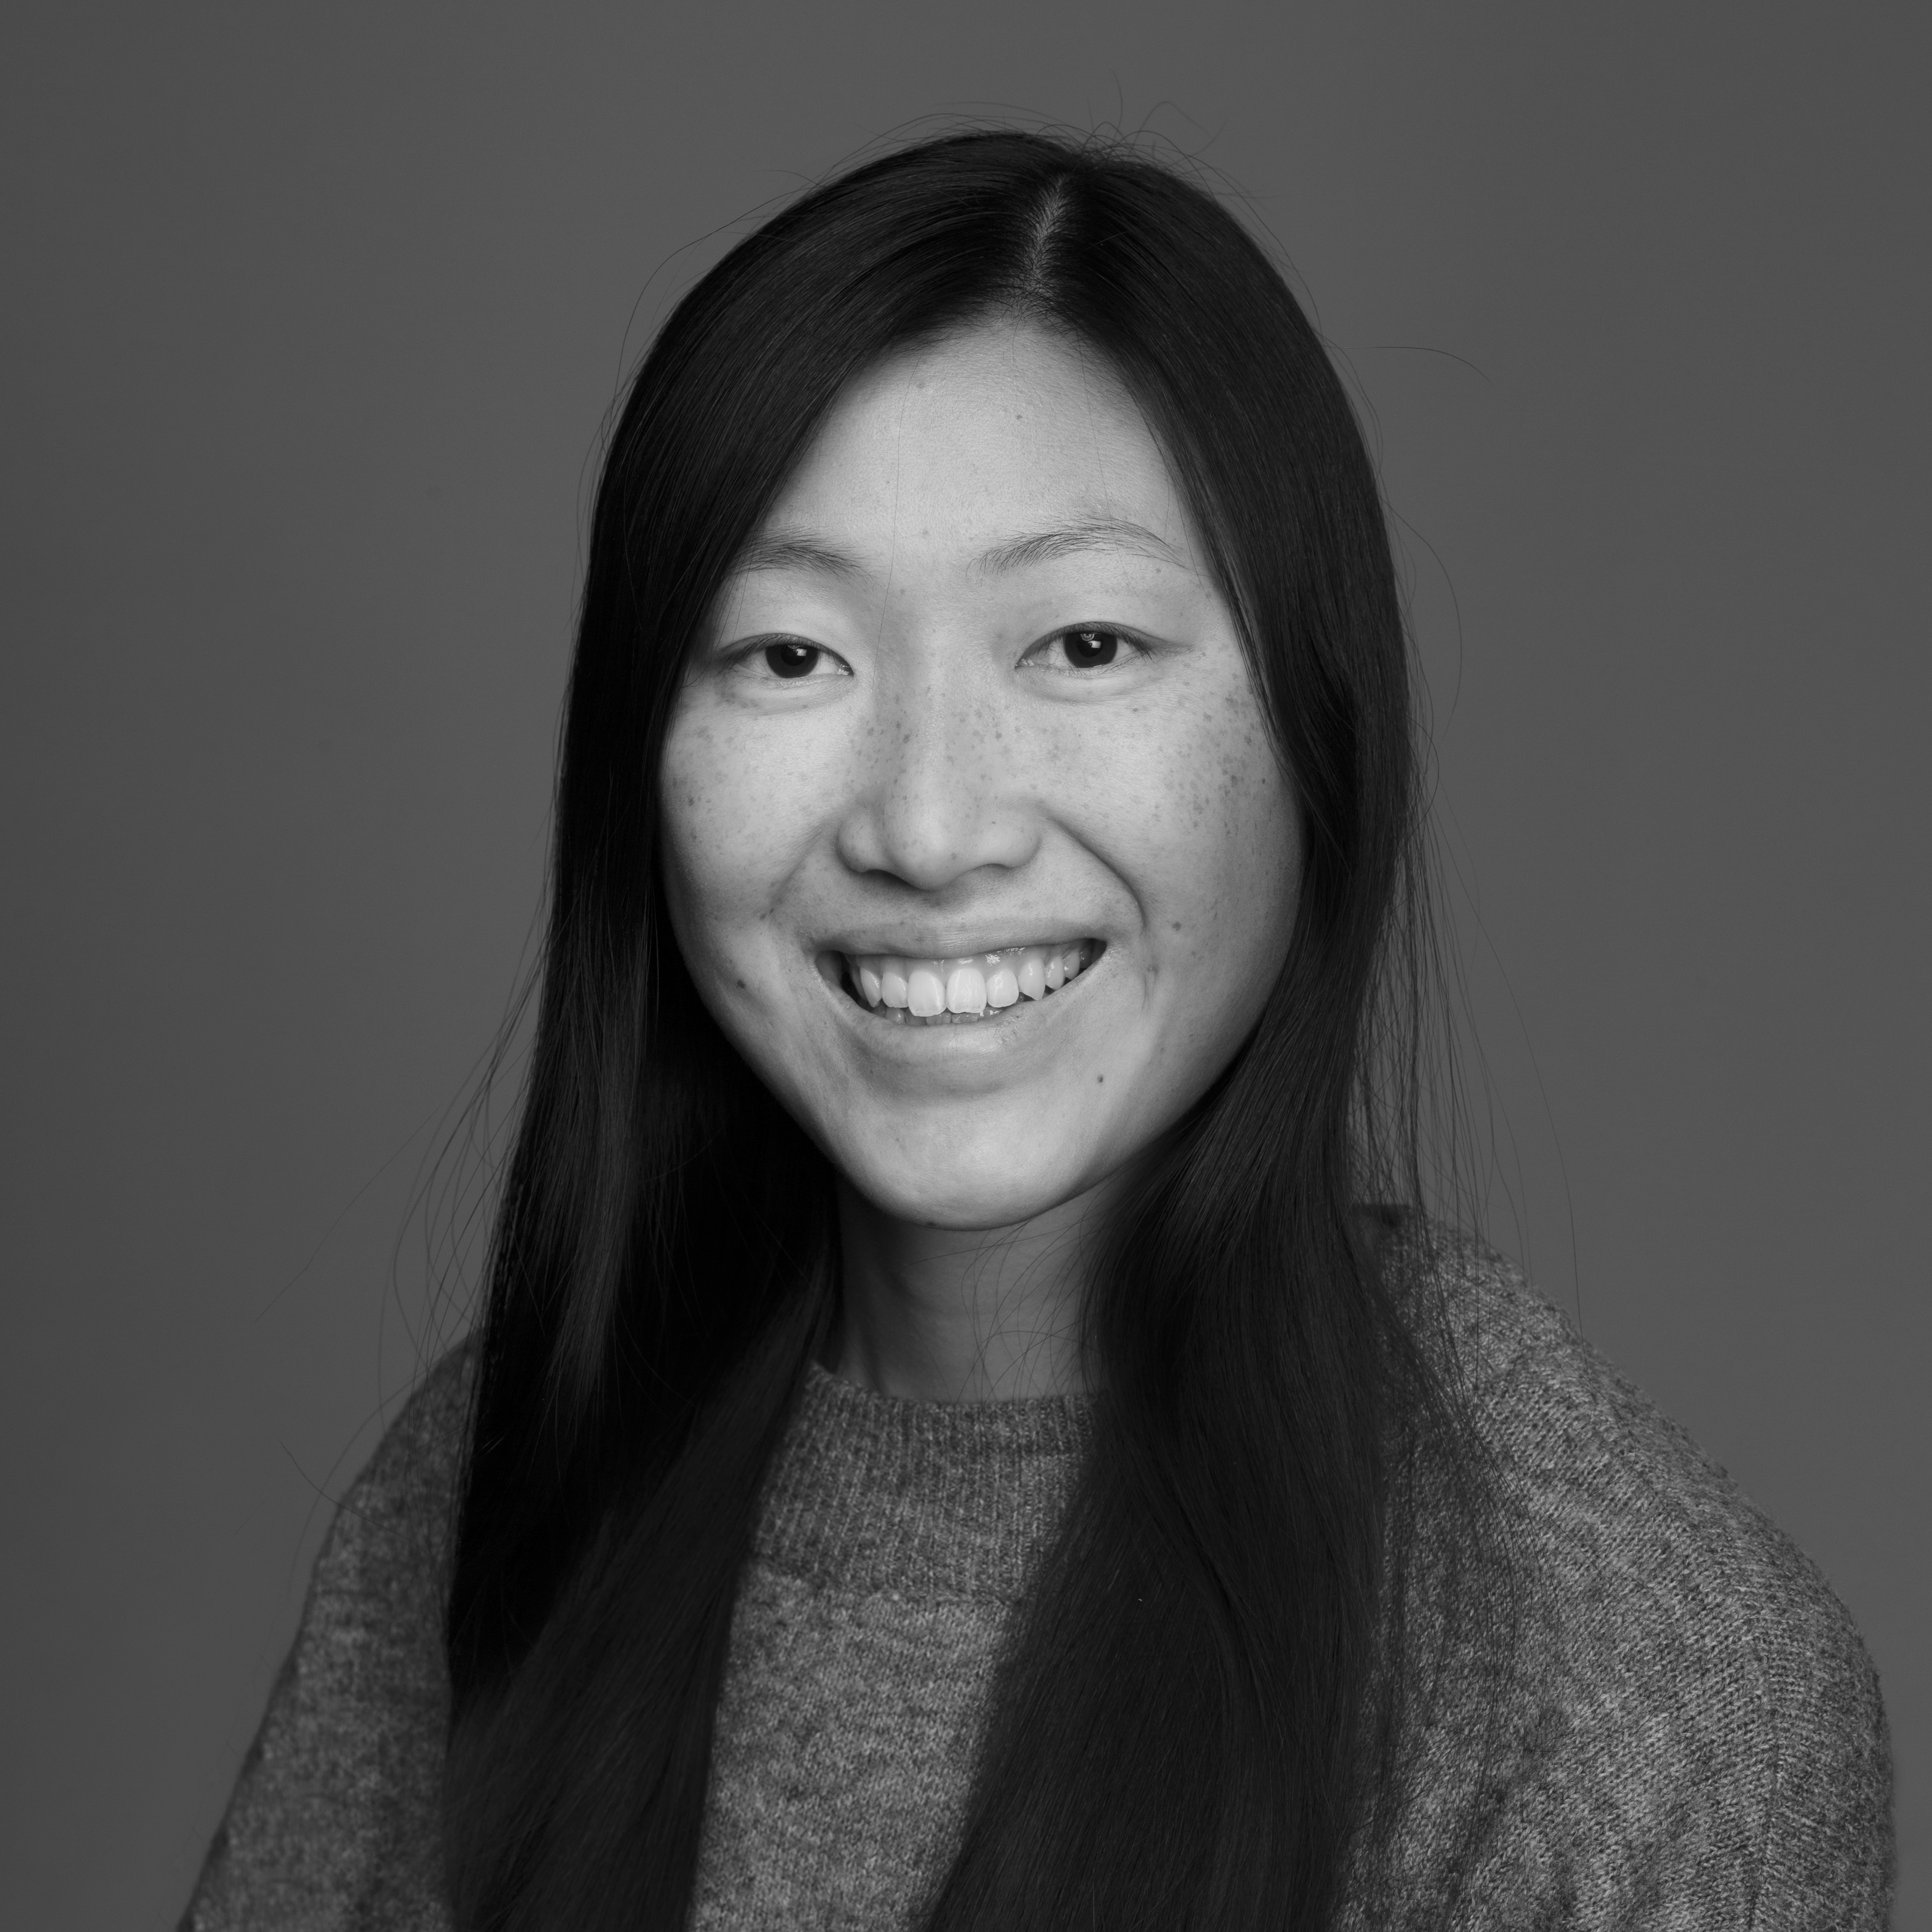 Anni Yang Christensen